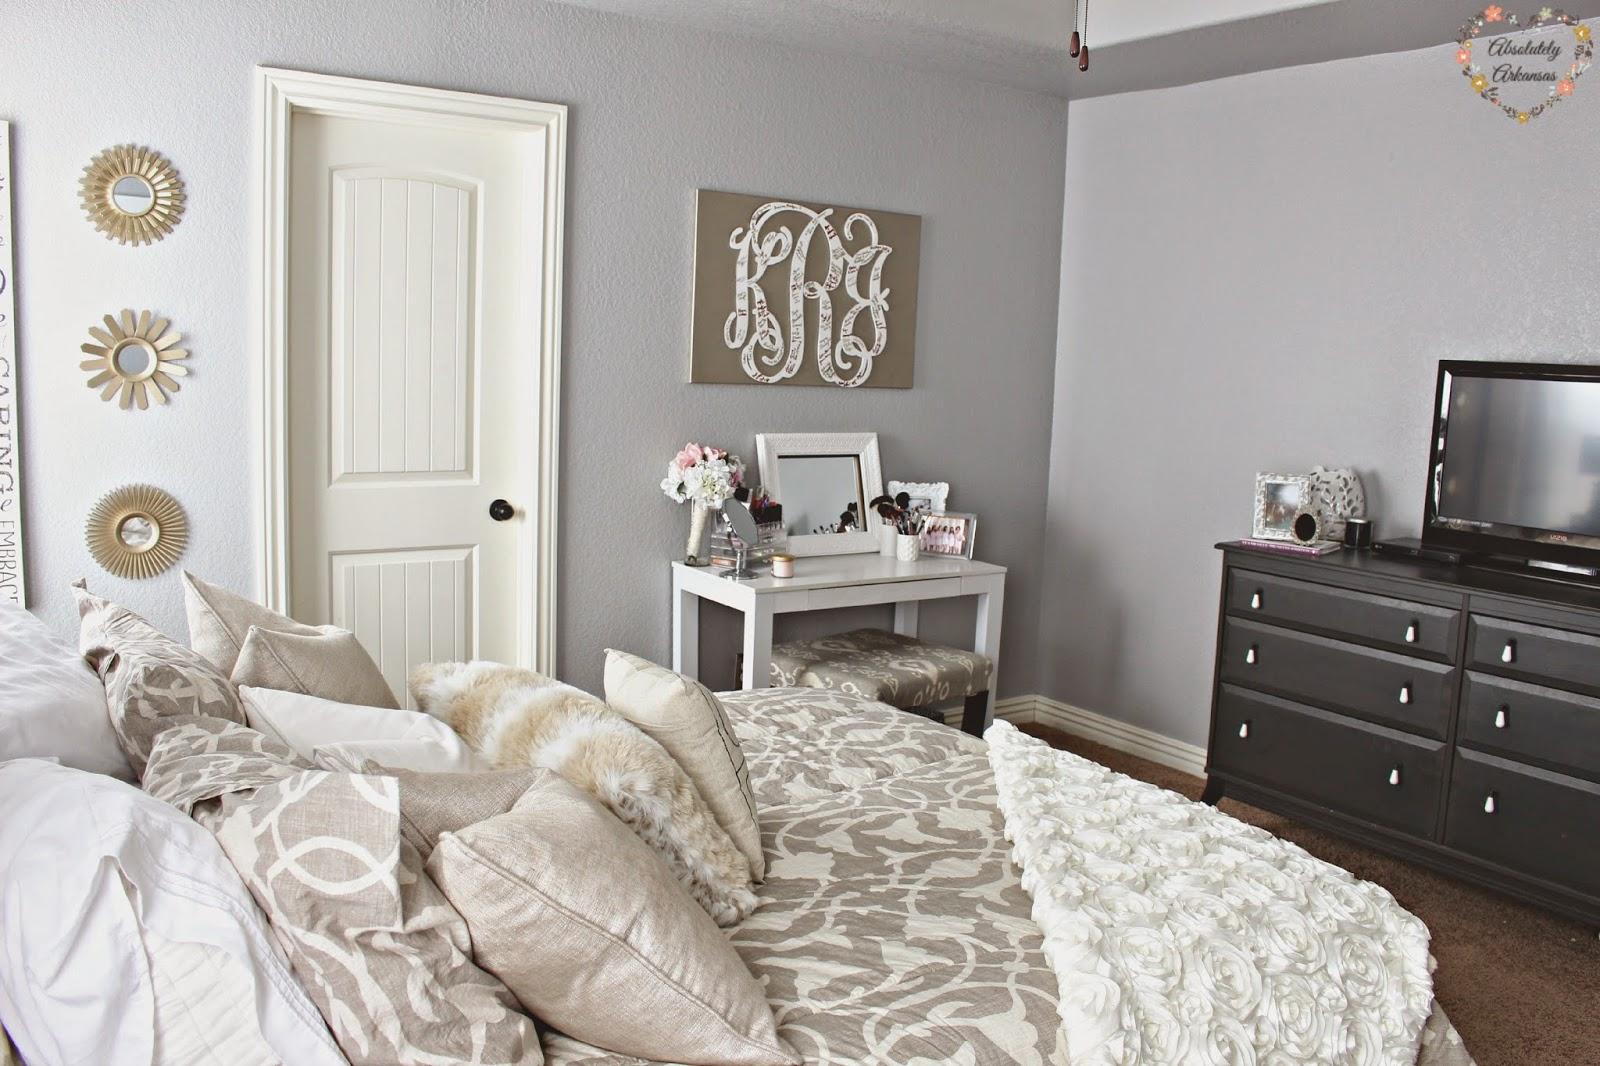 Remarkable Rose Co Blog Master Bedroom Revealed Creativecarmelina Interior Chair Design Creativecarmelinacom